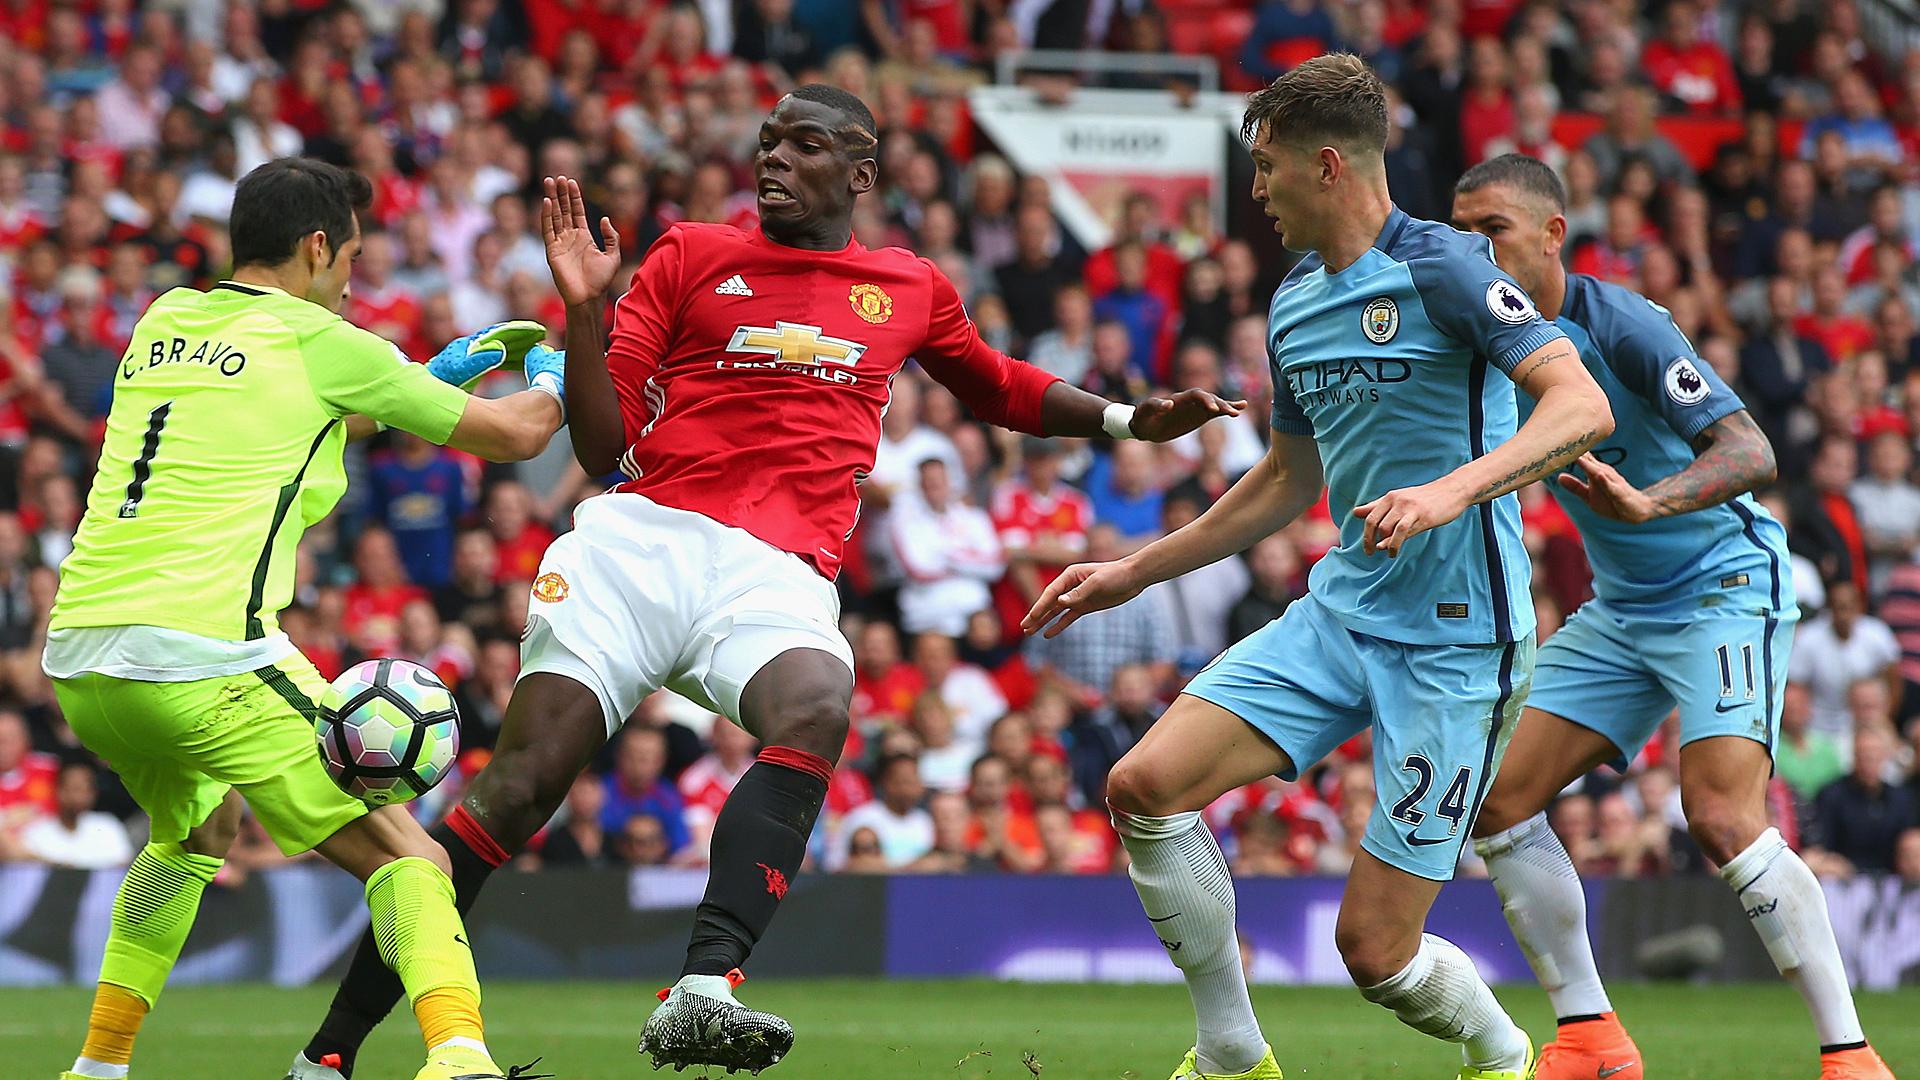 Manchester United Manchester City Paul Pogba Claudio Bravo 10262016